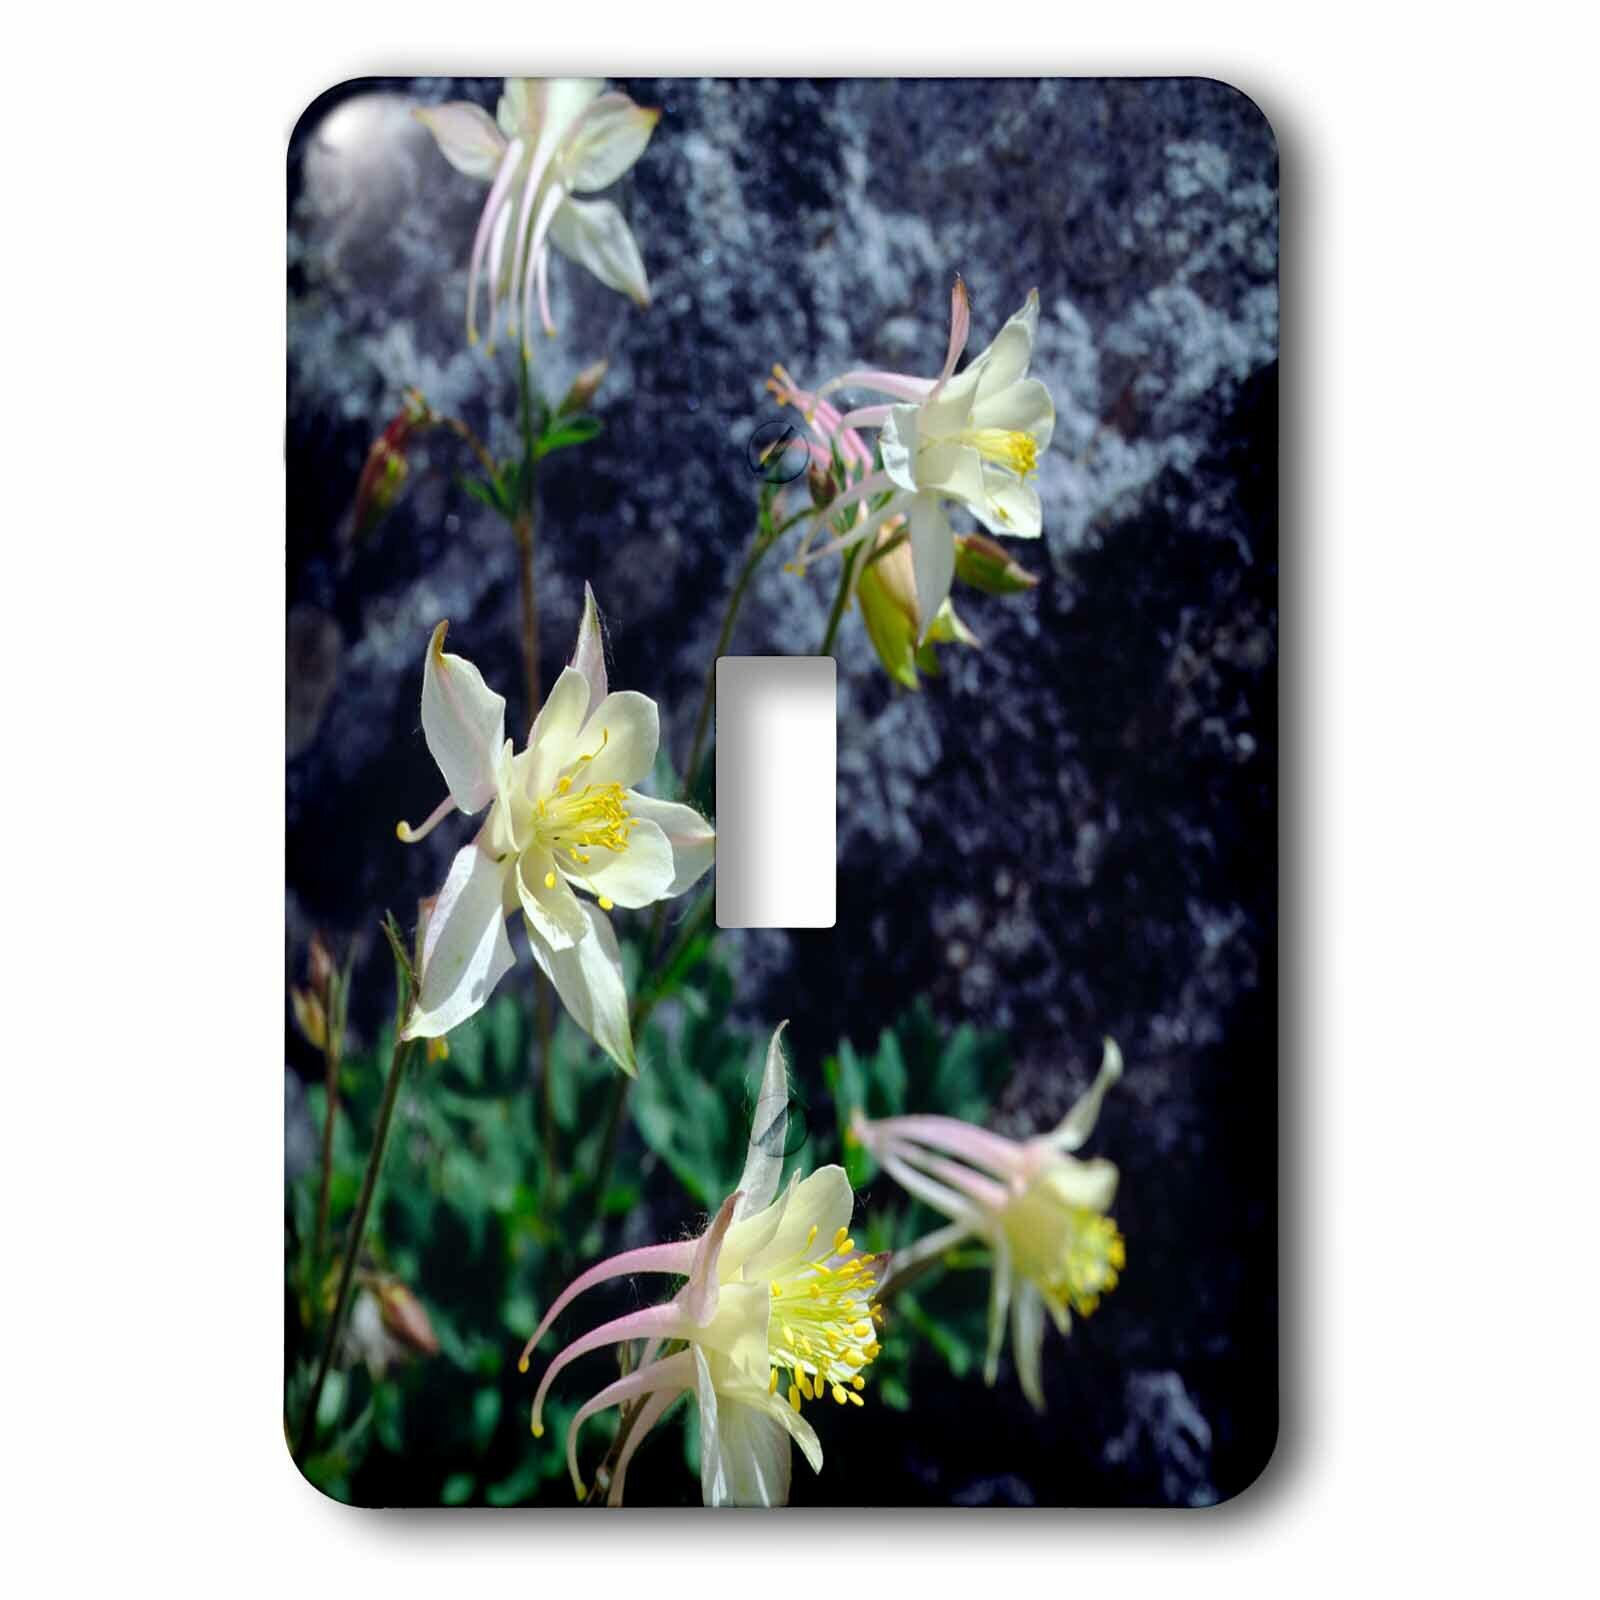 3drose Columbine Wildflowers 1 Gang Toggle Light Switch Wall Plate Wayfair